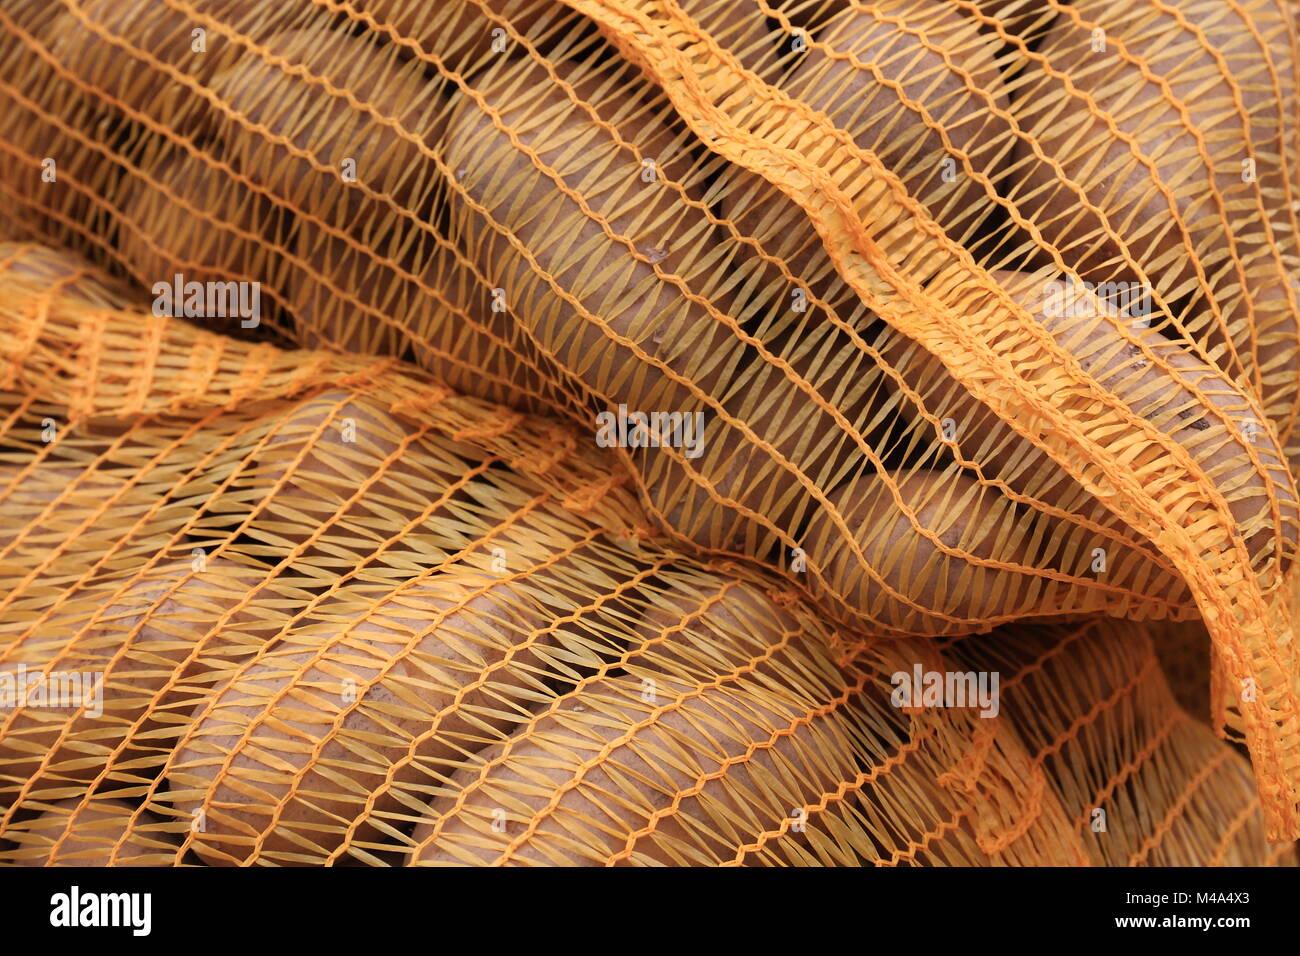 Potato sacks - Stock Image